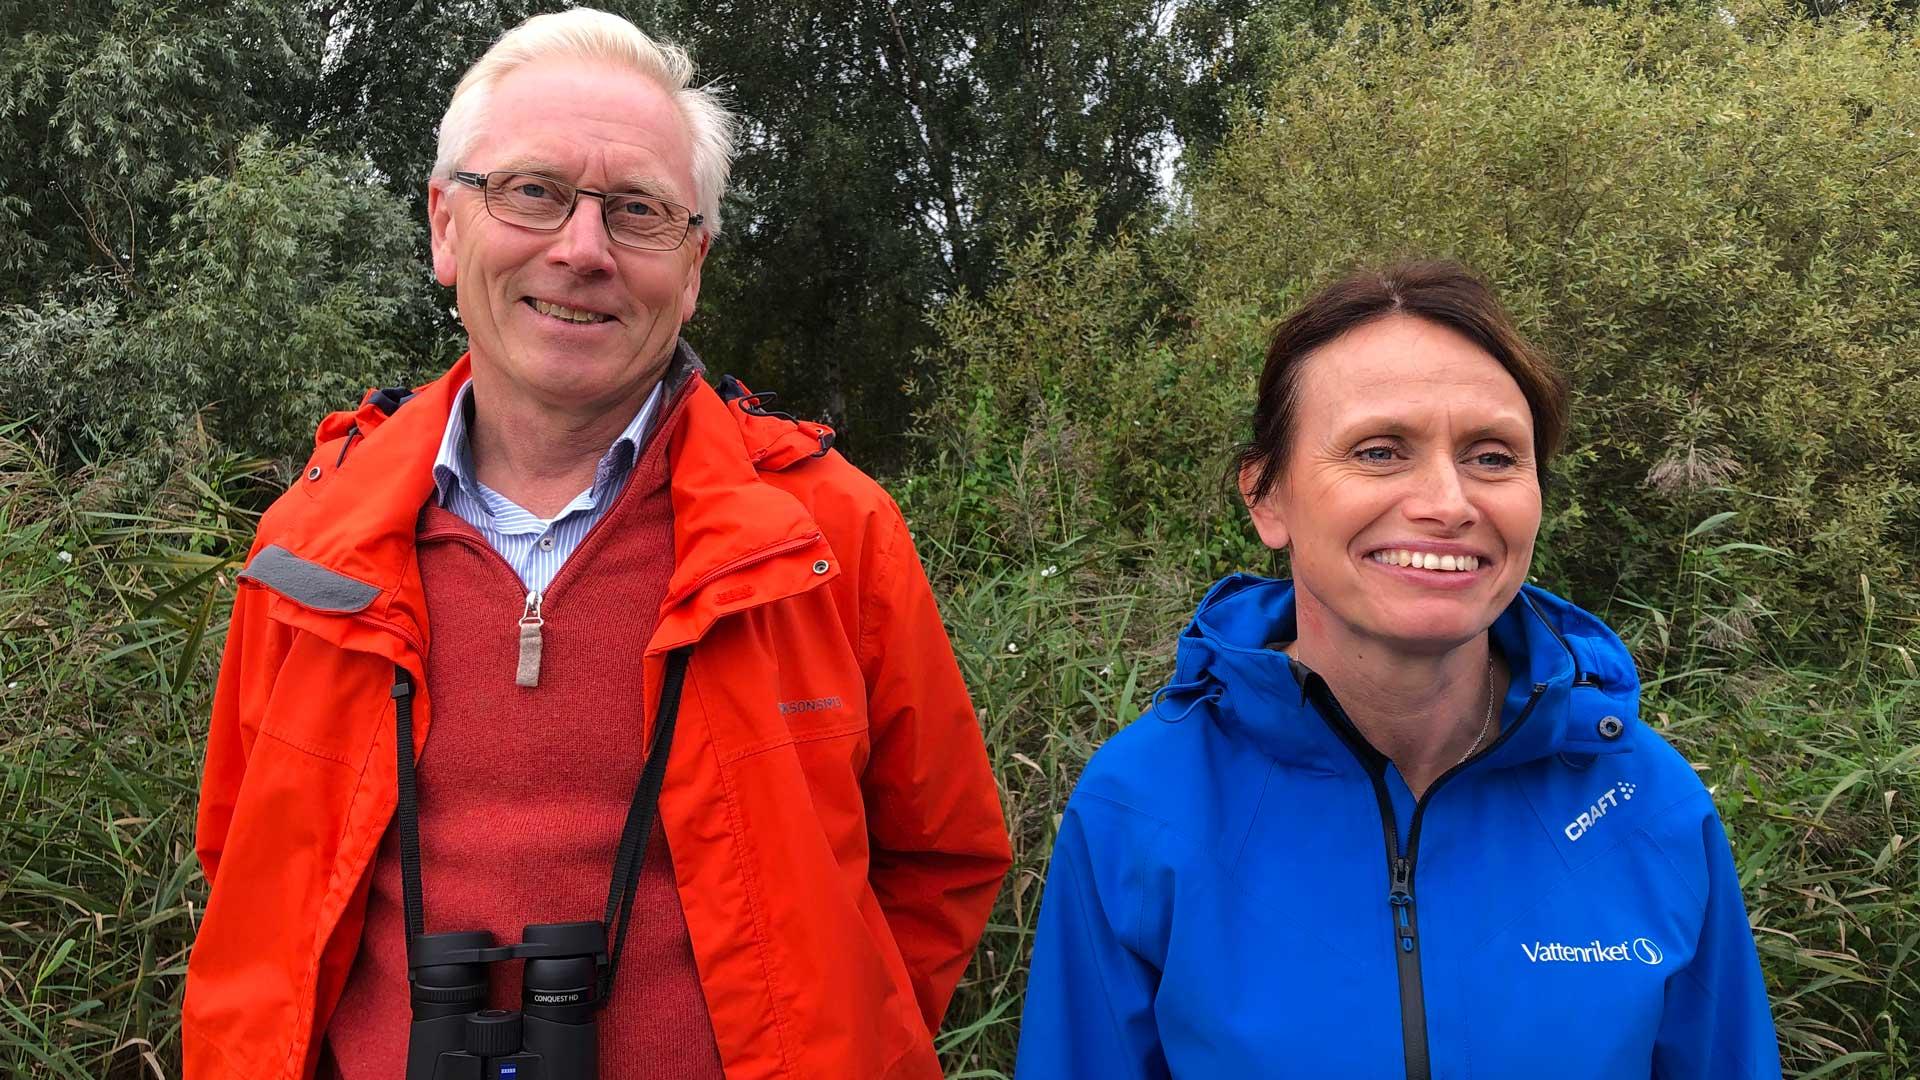 Jens Weibull och Carina Wettemark